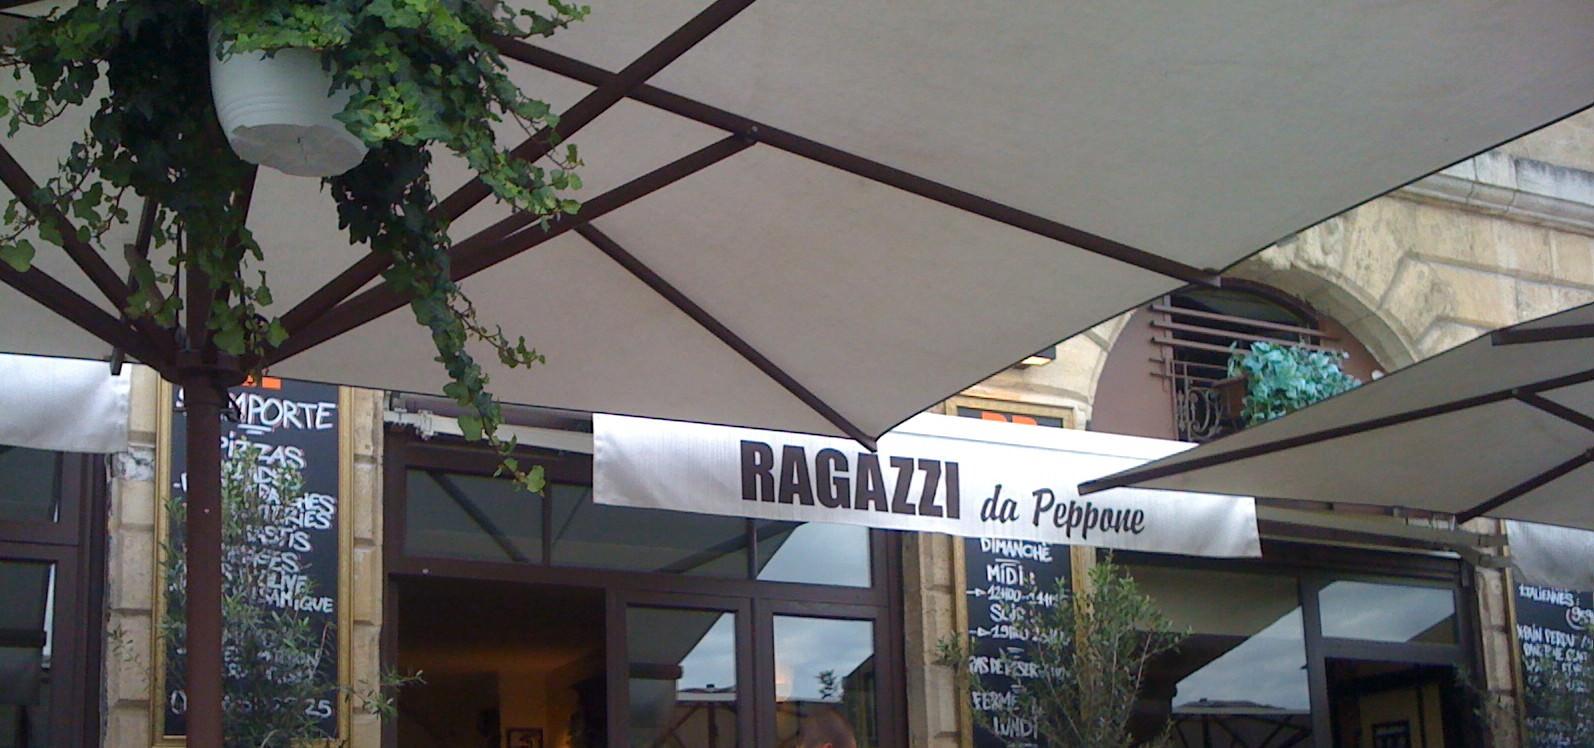 Pizza Peppone Bordeaux Carte.Ragazzi Da Peppone I Resto Italien I Bordeaux 33 Audrey Cuisine